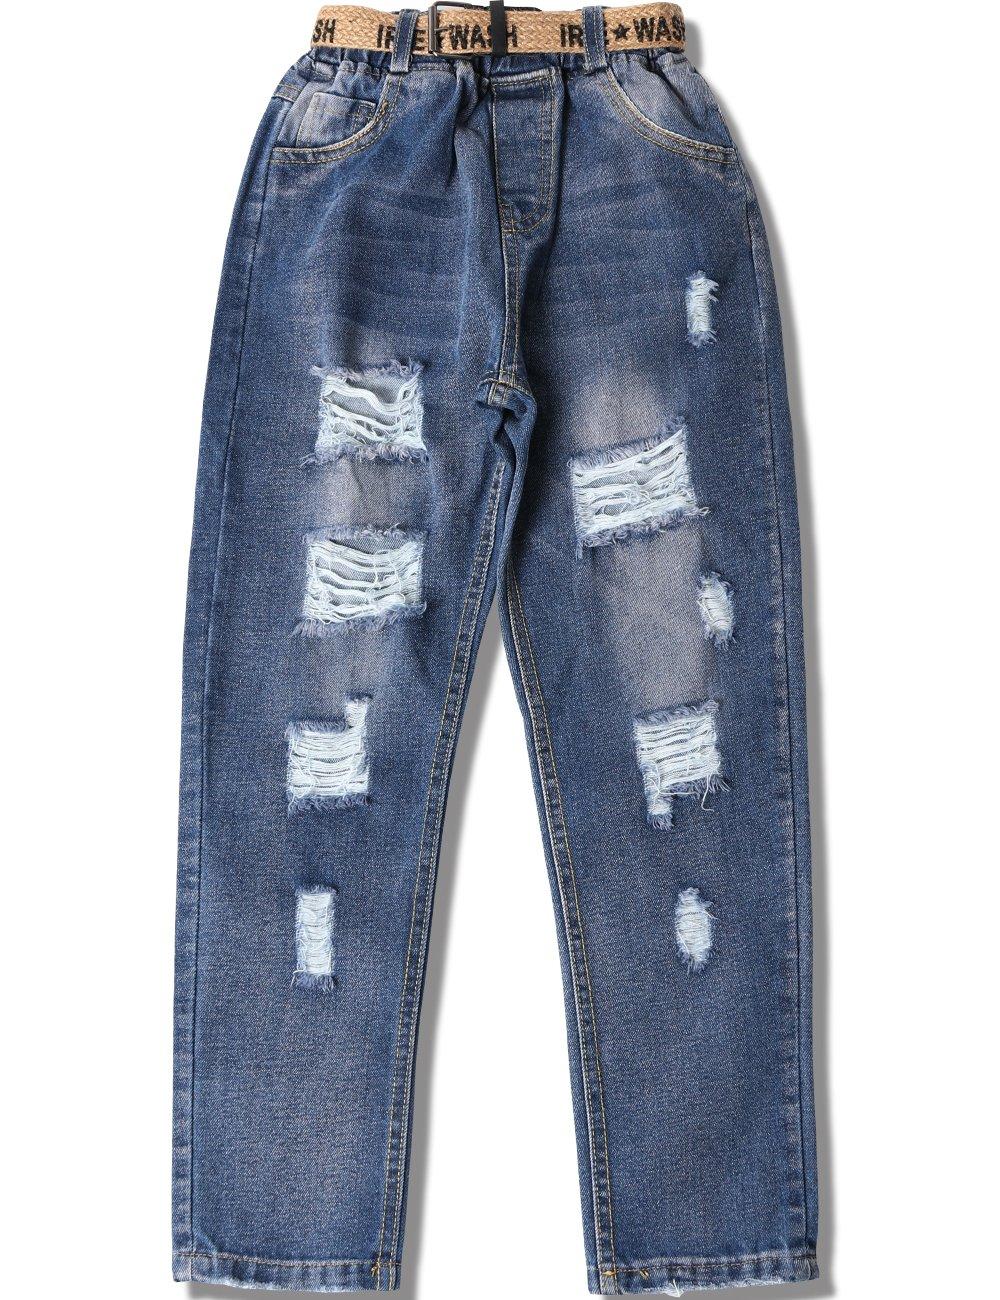 WIYOSHY Girls Skinny Ripped Elastic Pull On Denim Jeans Belt Age 5-14 Years (Blue, 7/8 (140))